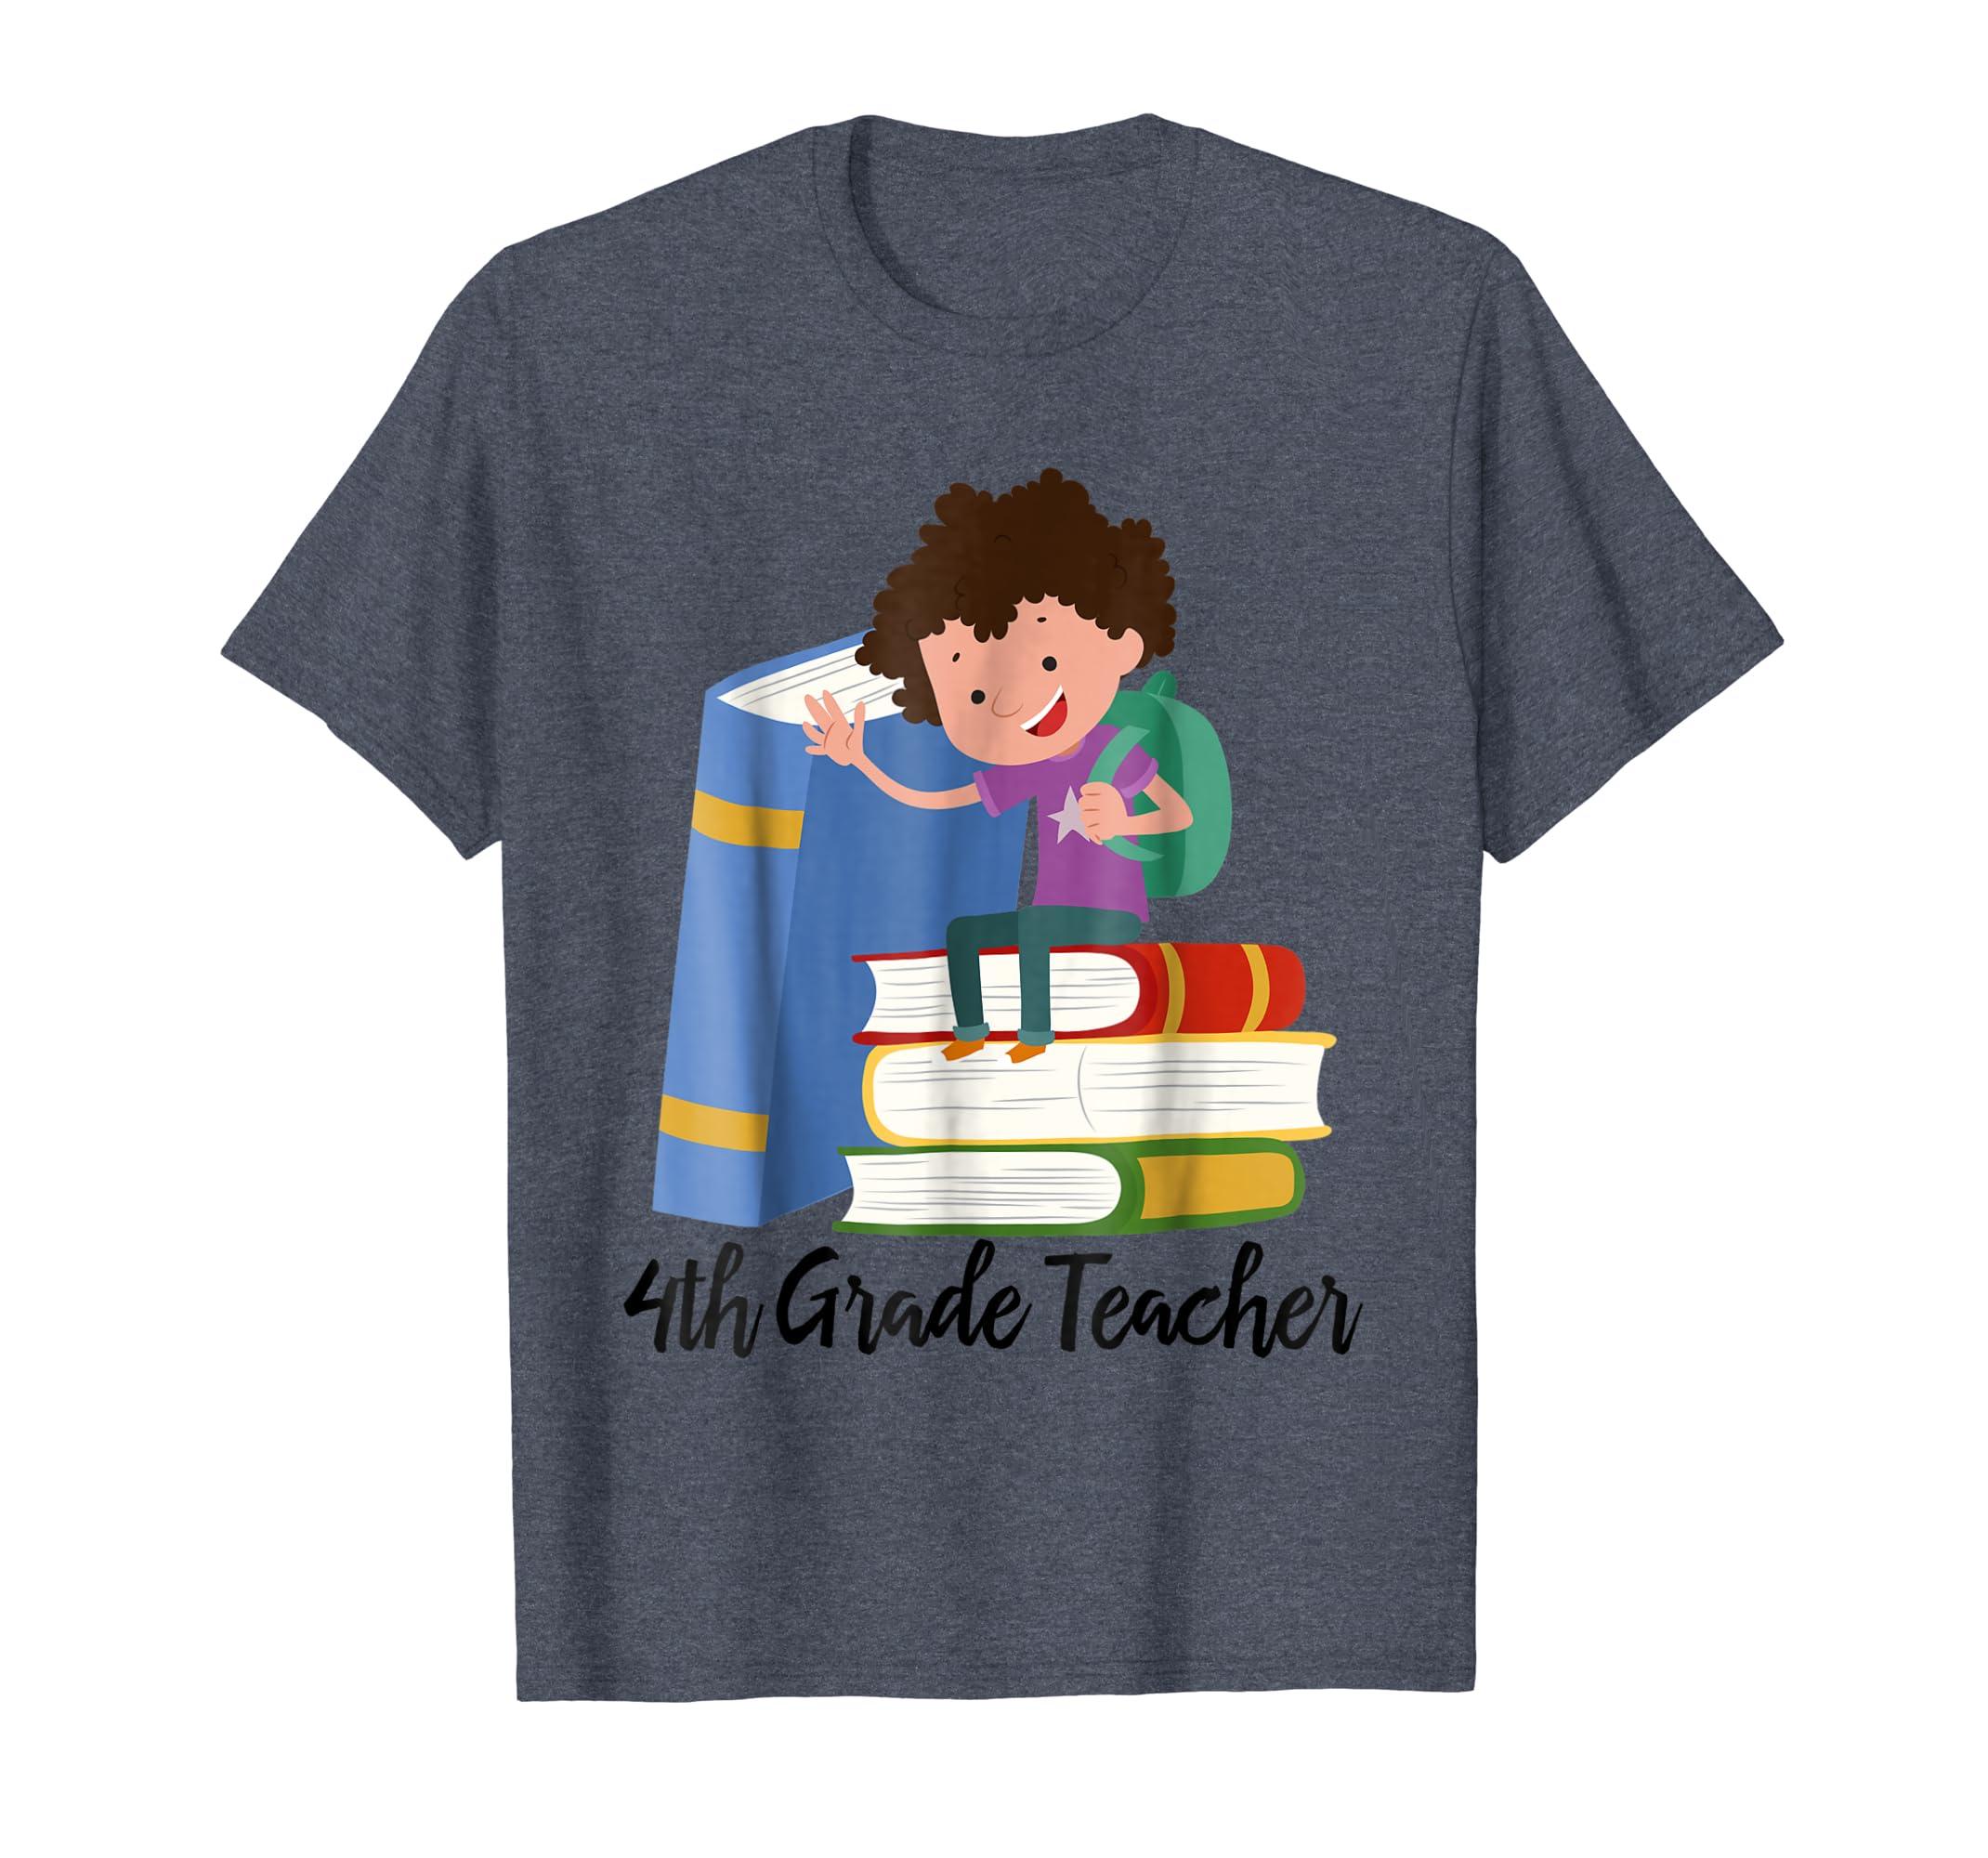 4th Grade Teacher, Teach Gifts Ideas, Teacher T-Shirts-SFL